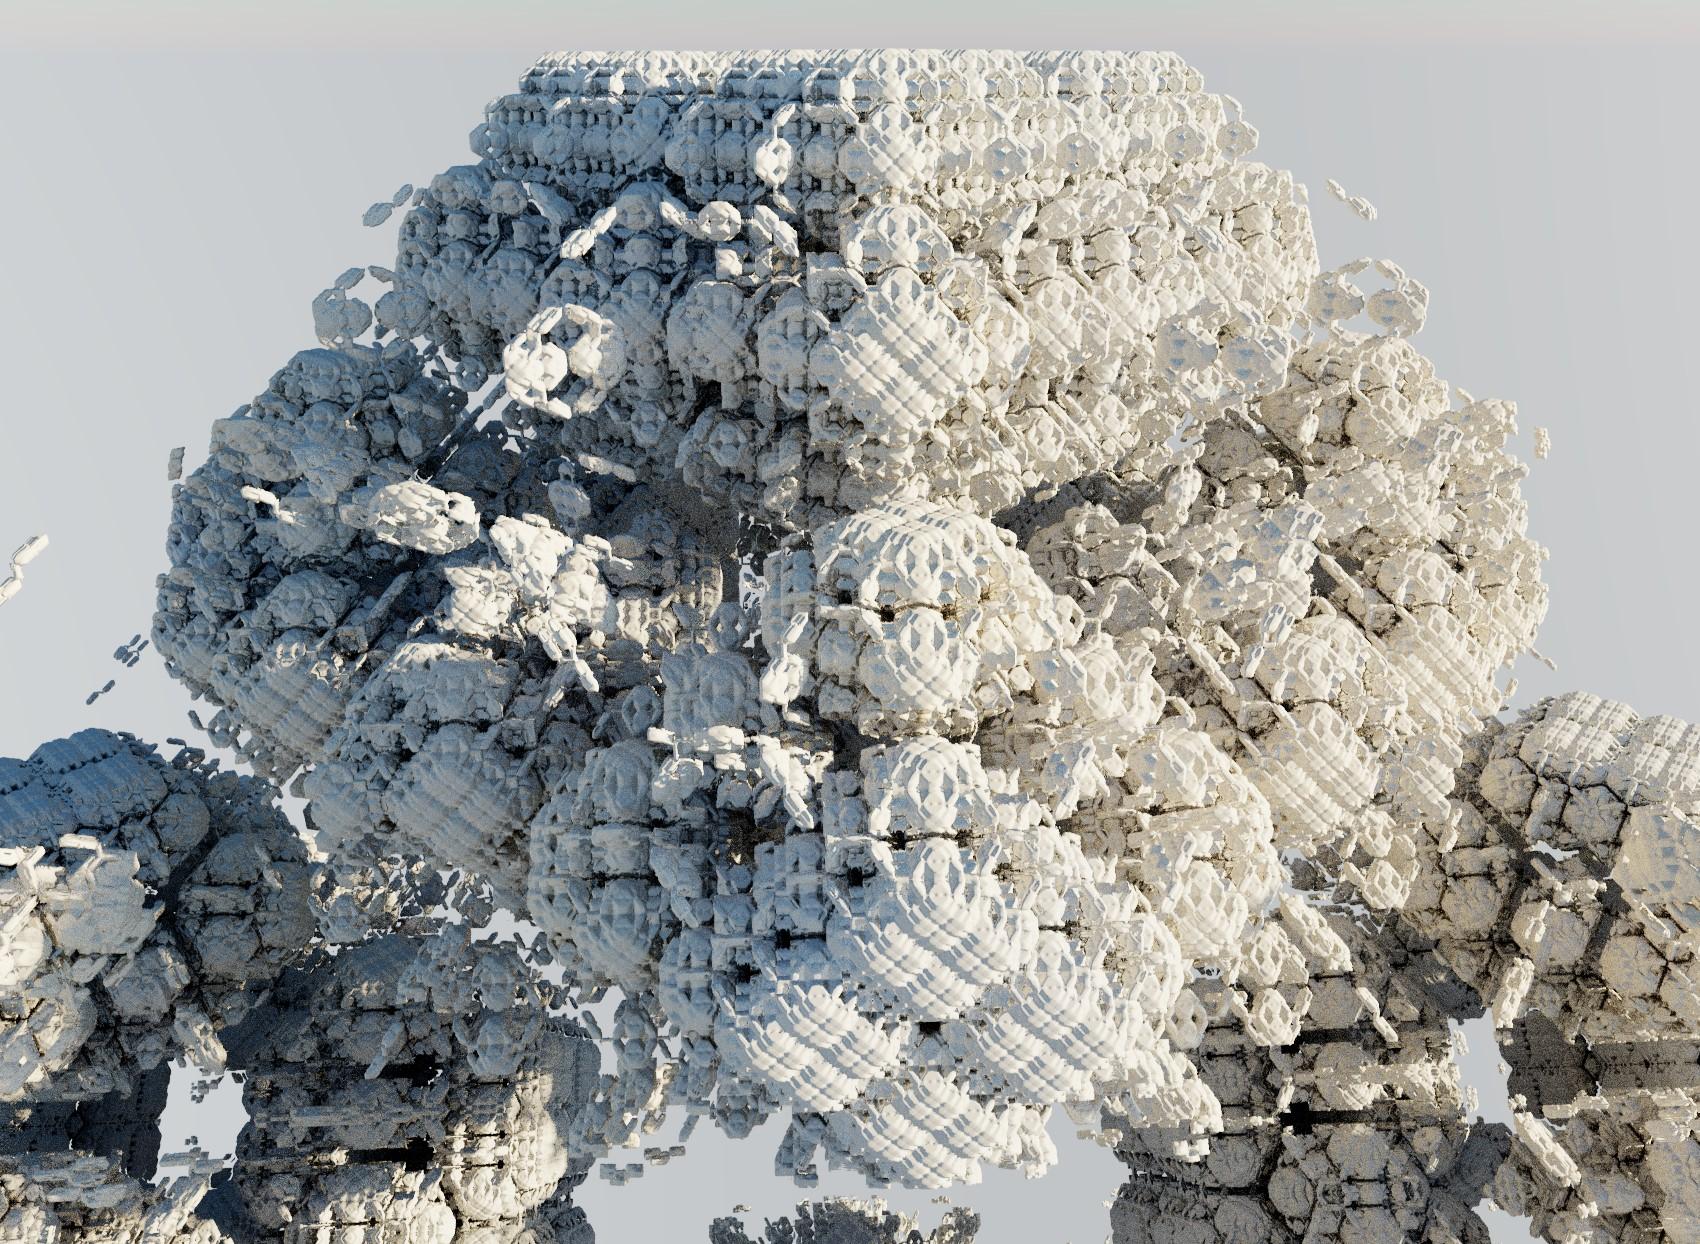 deepsalvage ii 3d fractal - photo #32